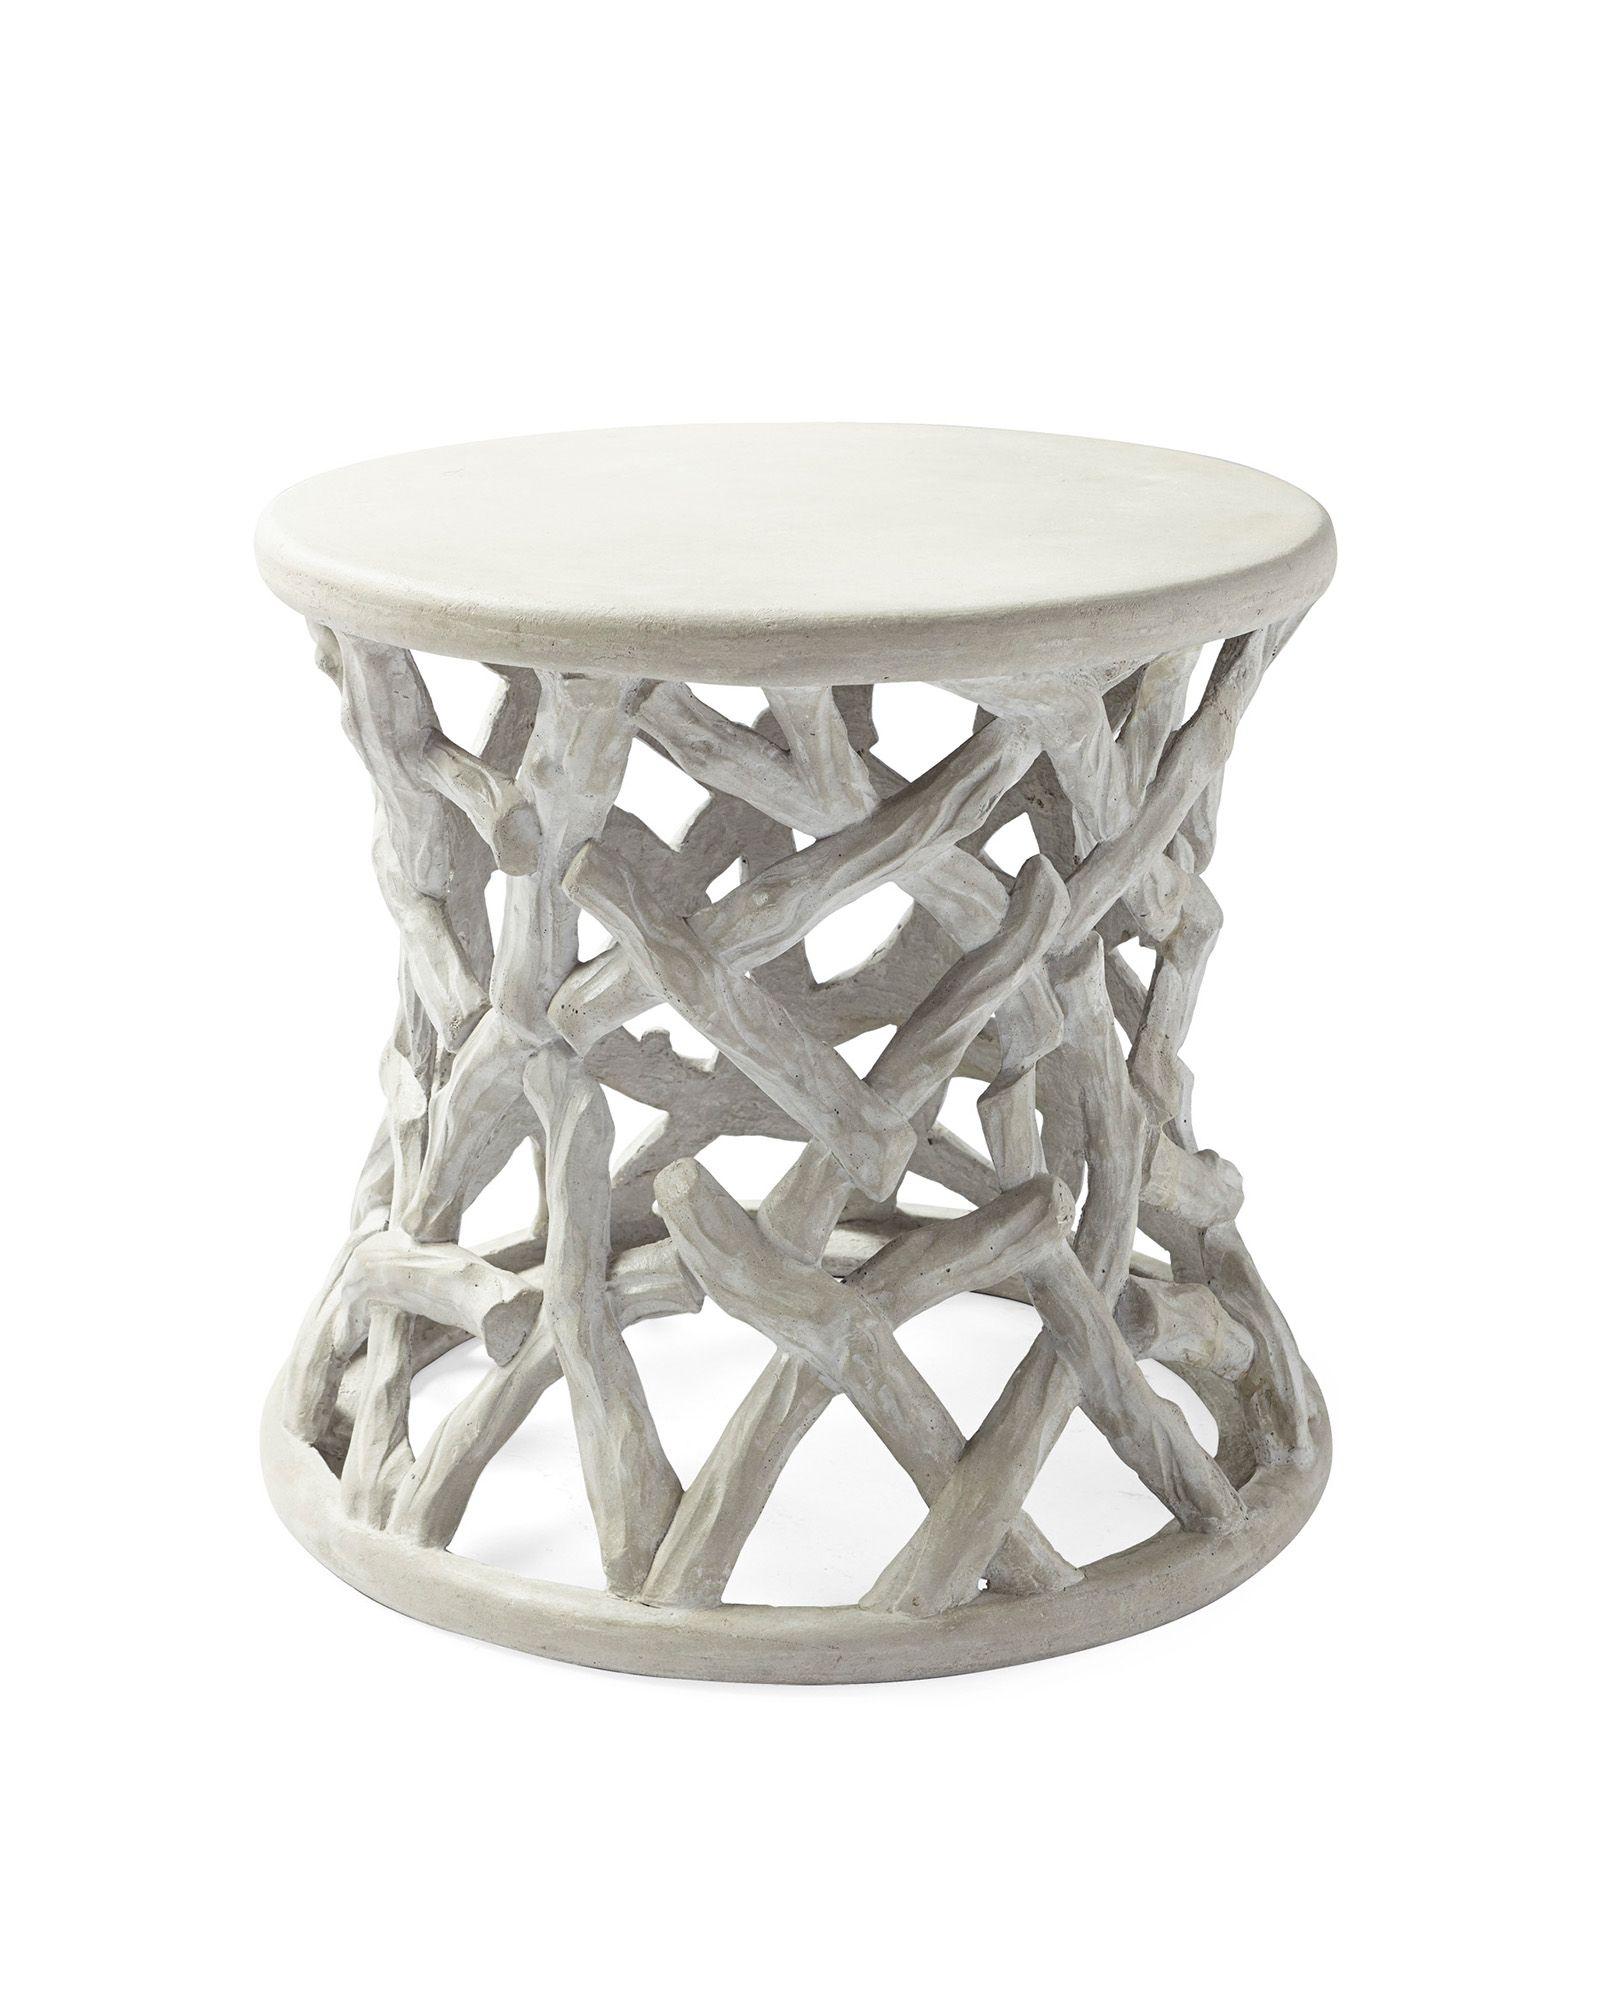 Vineyard Side Table Side Table Furniture Design Wooden Faux Bois